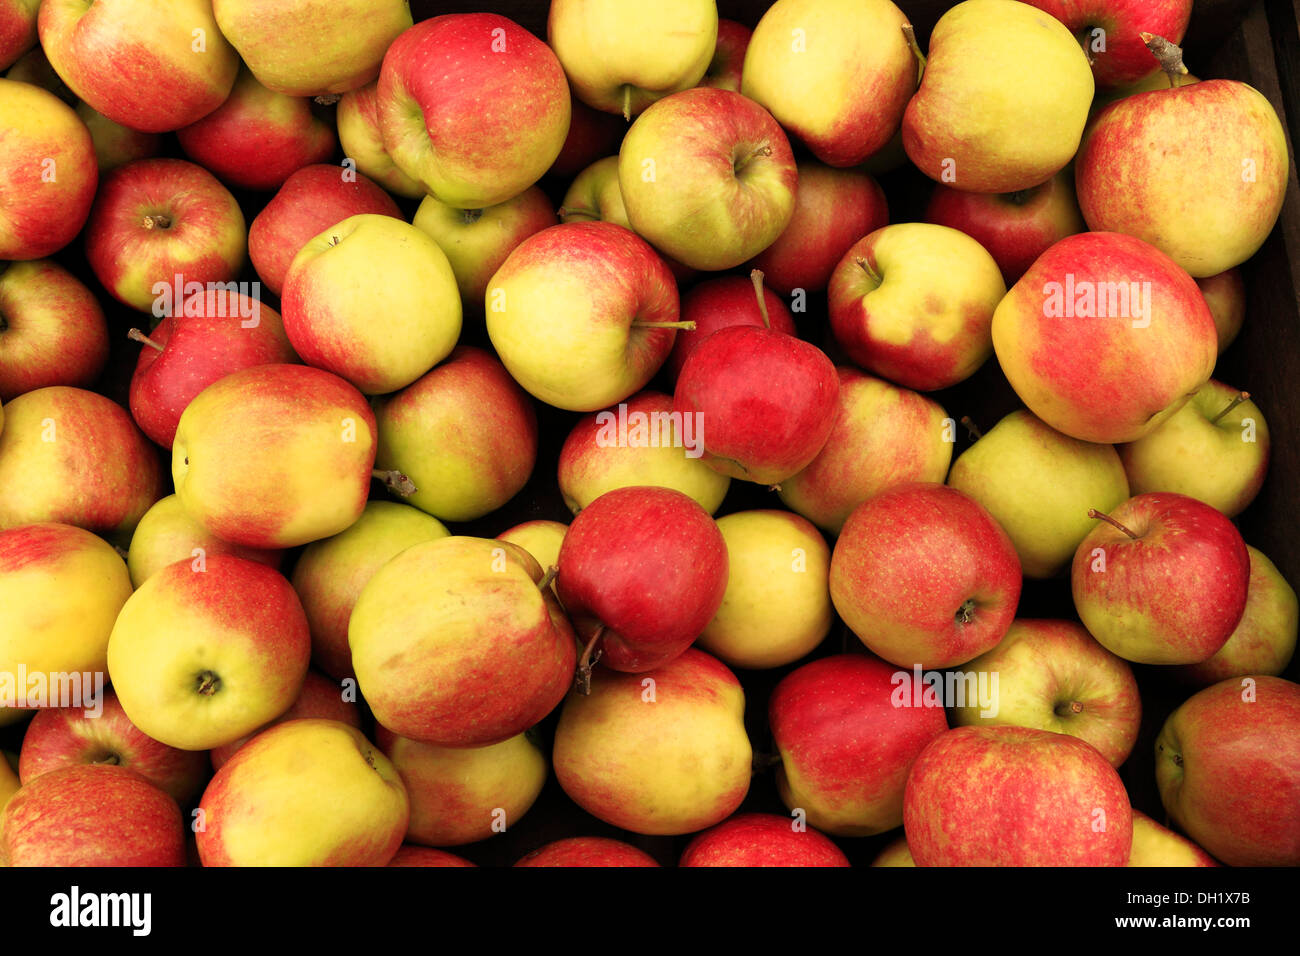 Apfel 'Crowngold', Schaufenster, Bauernhof Äpfel UK Stockbild